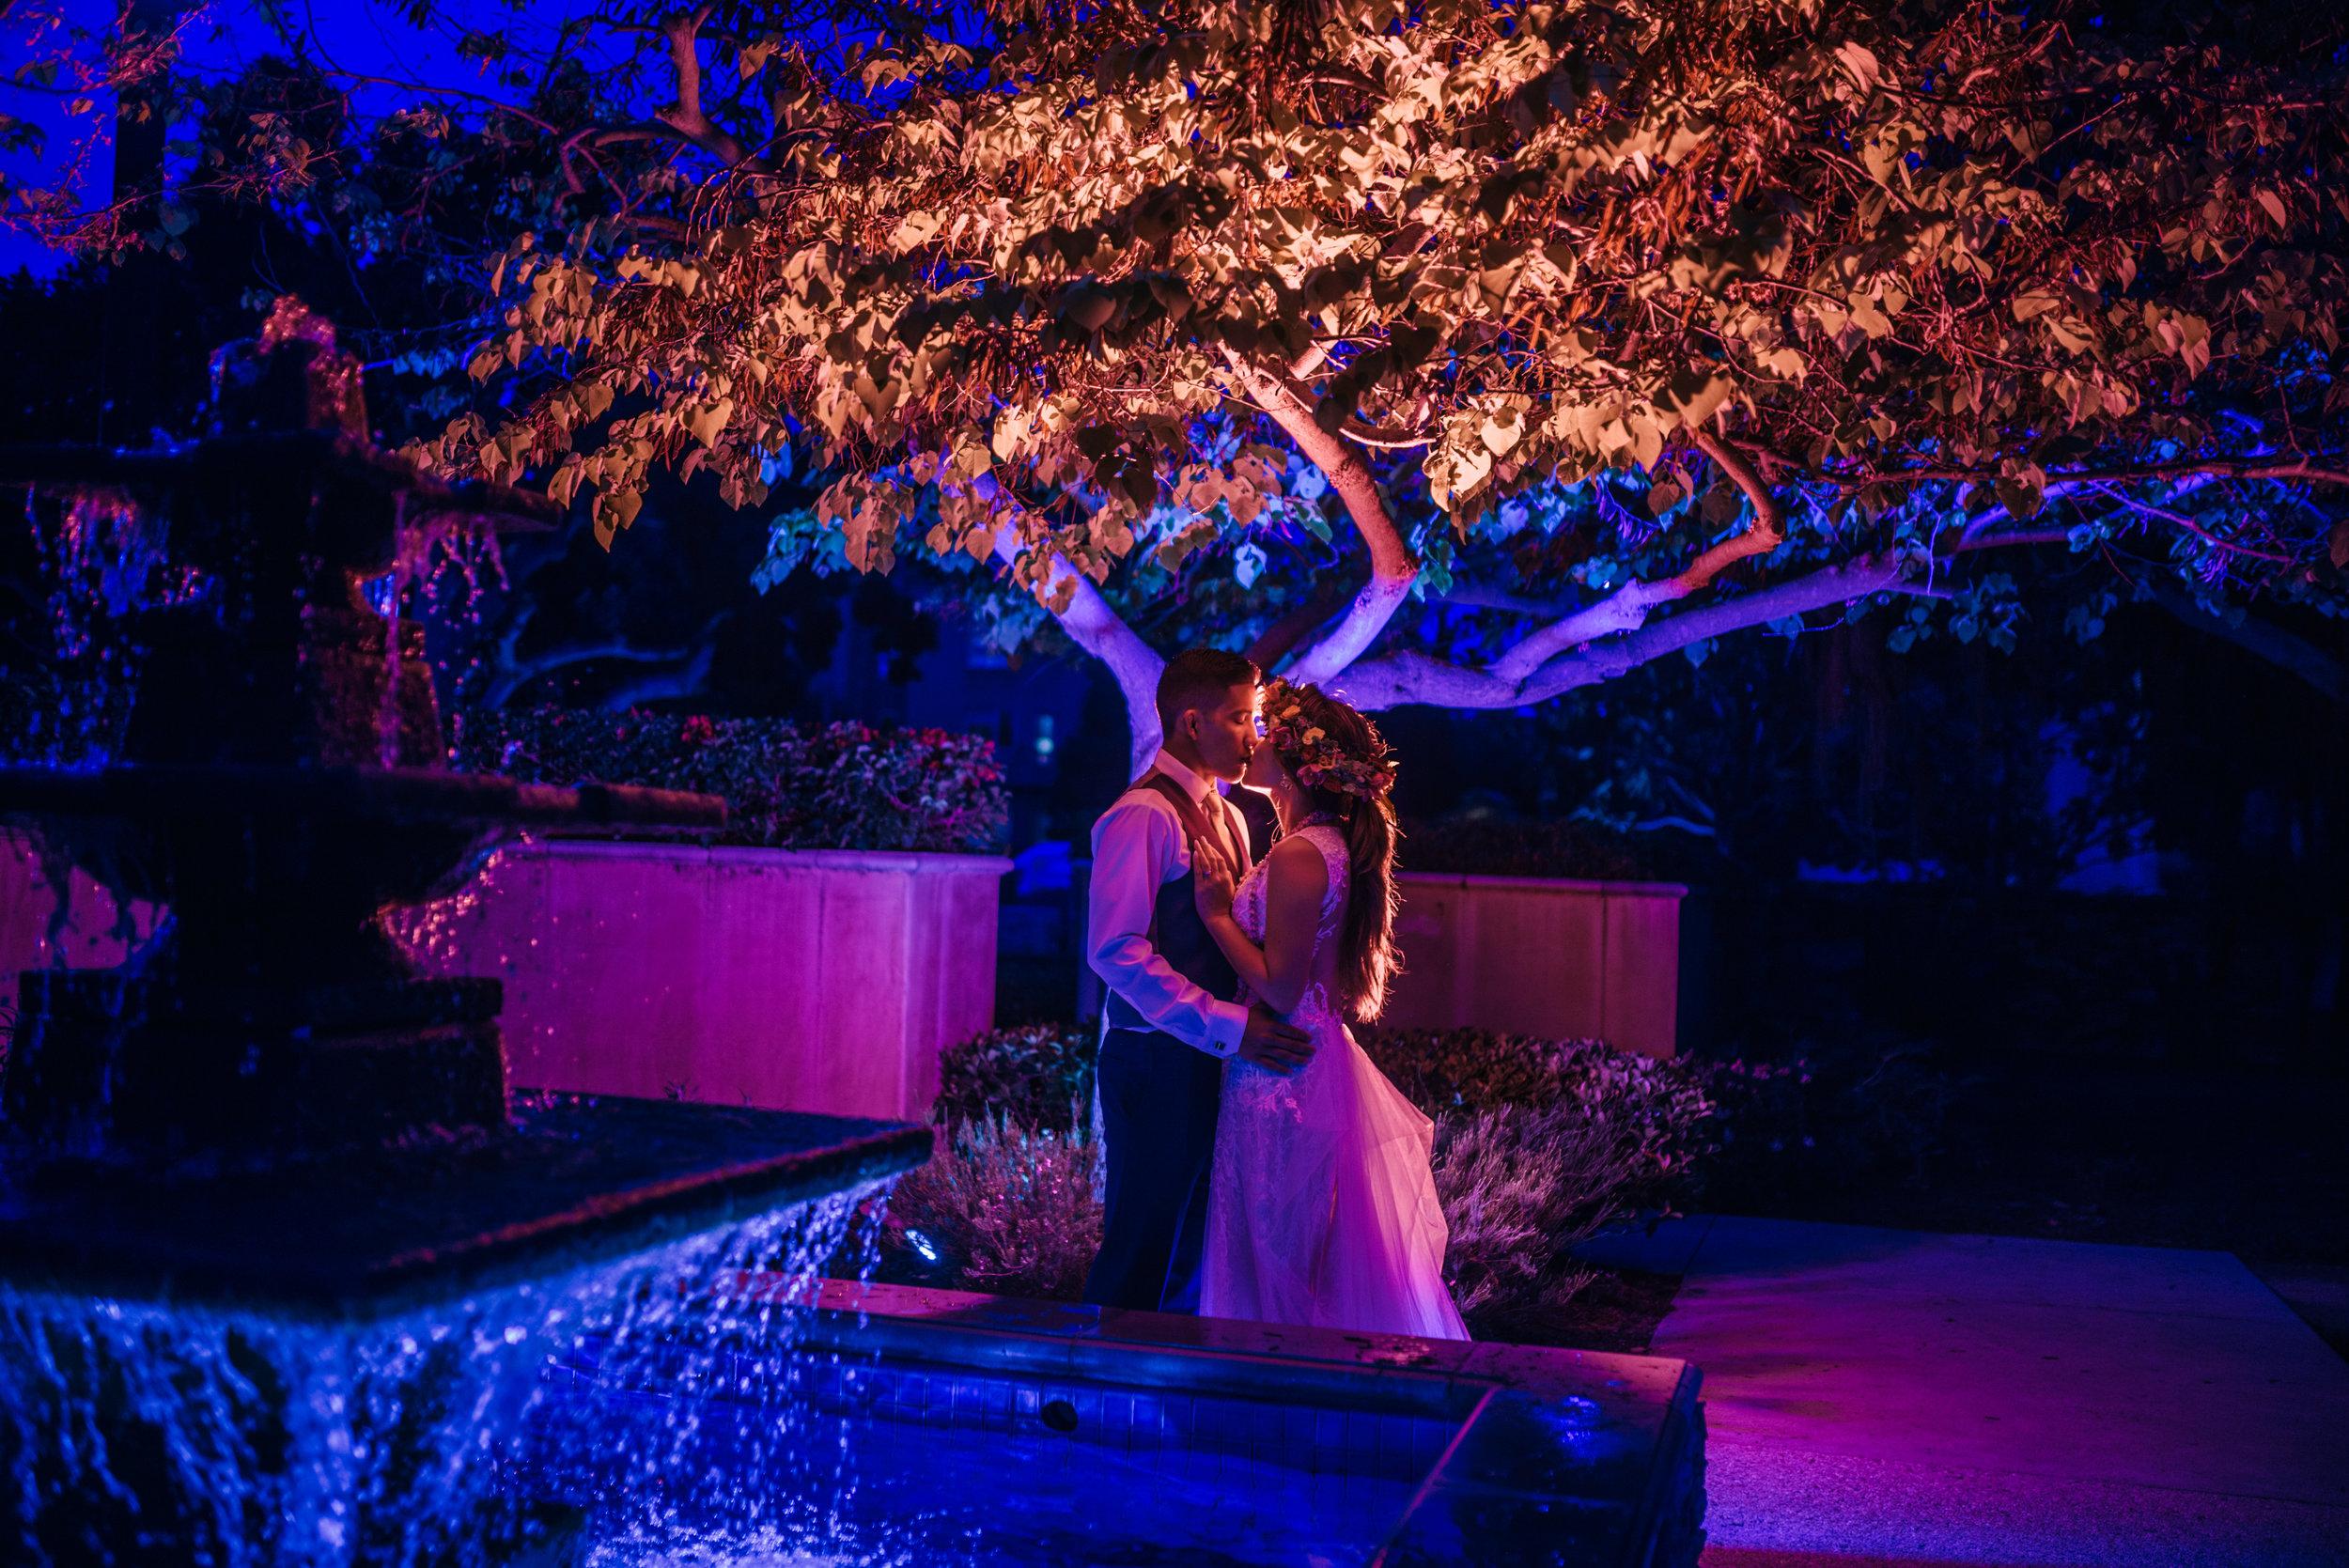 kaui-vince-centepoint-club-wedding-playa-vista-1.jpg